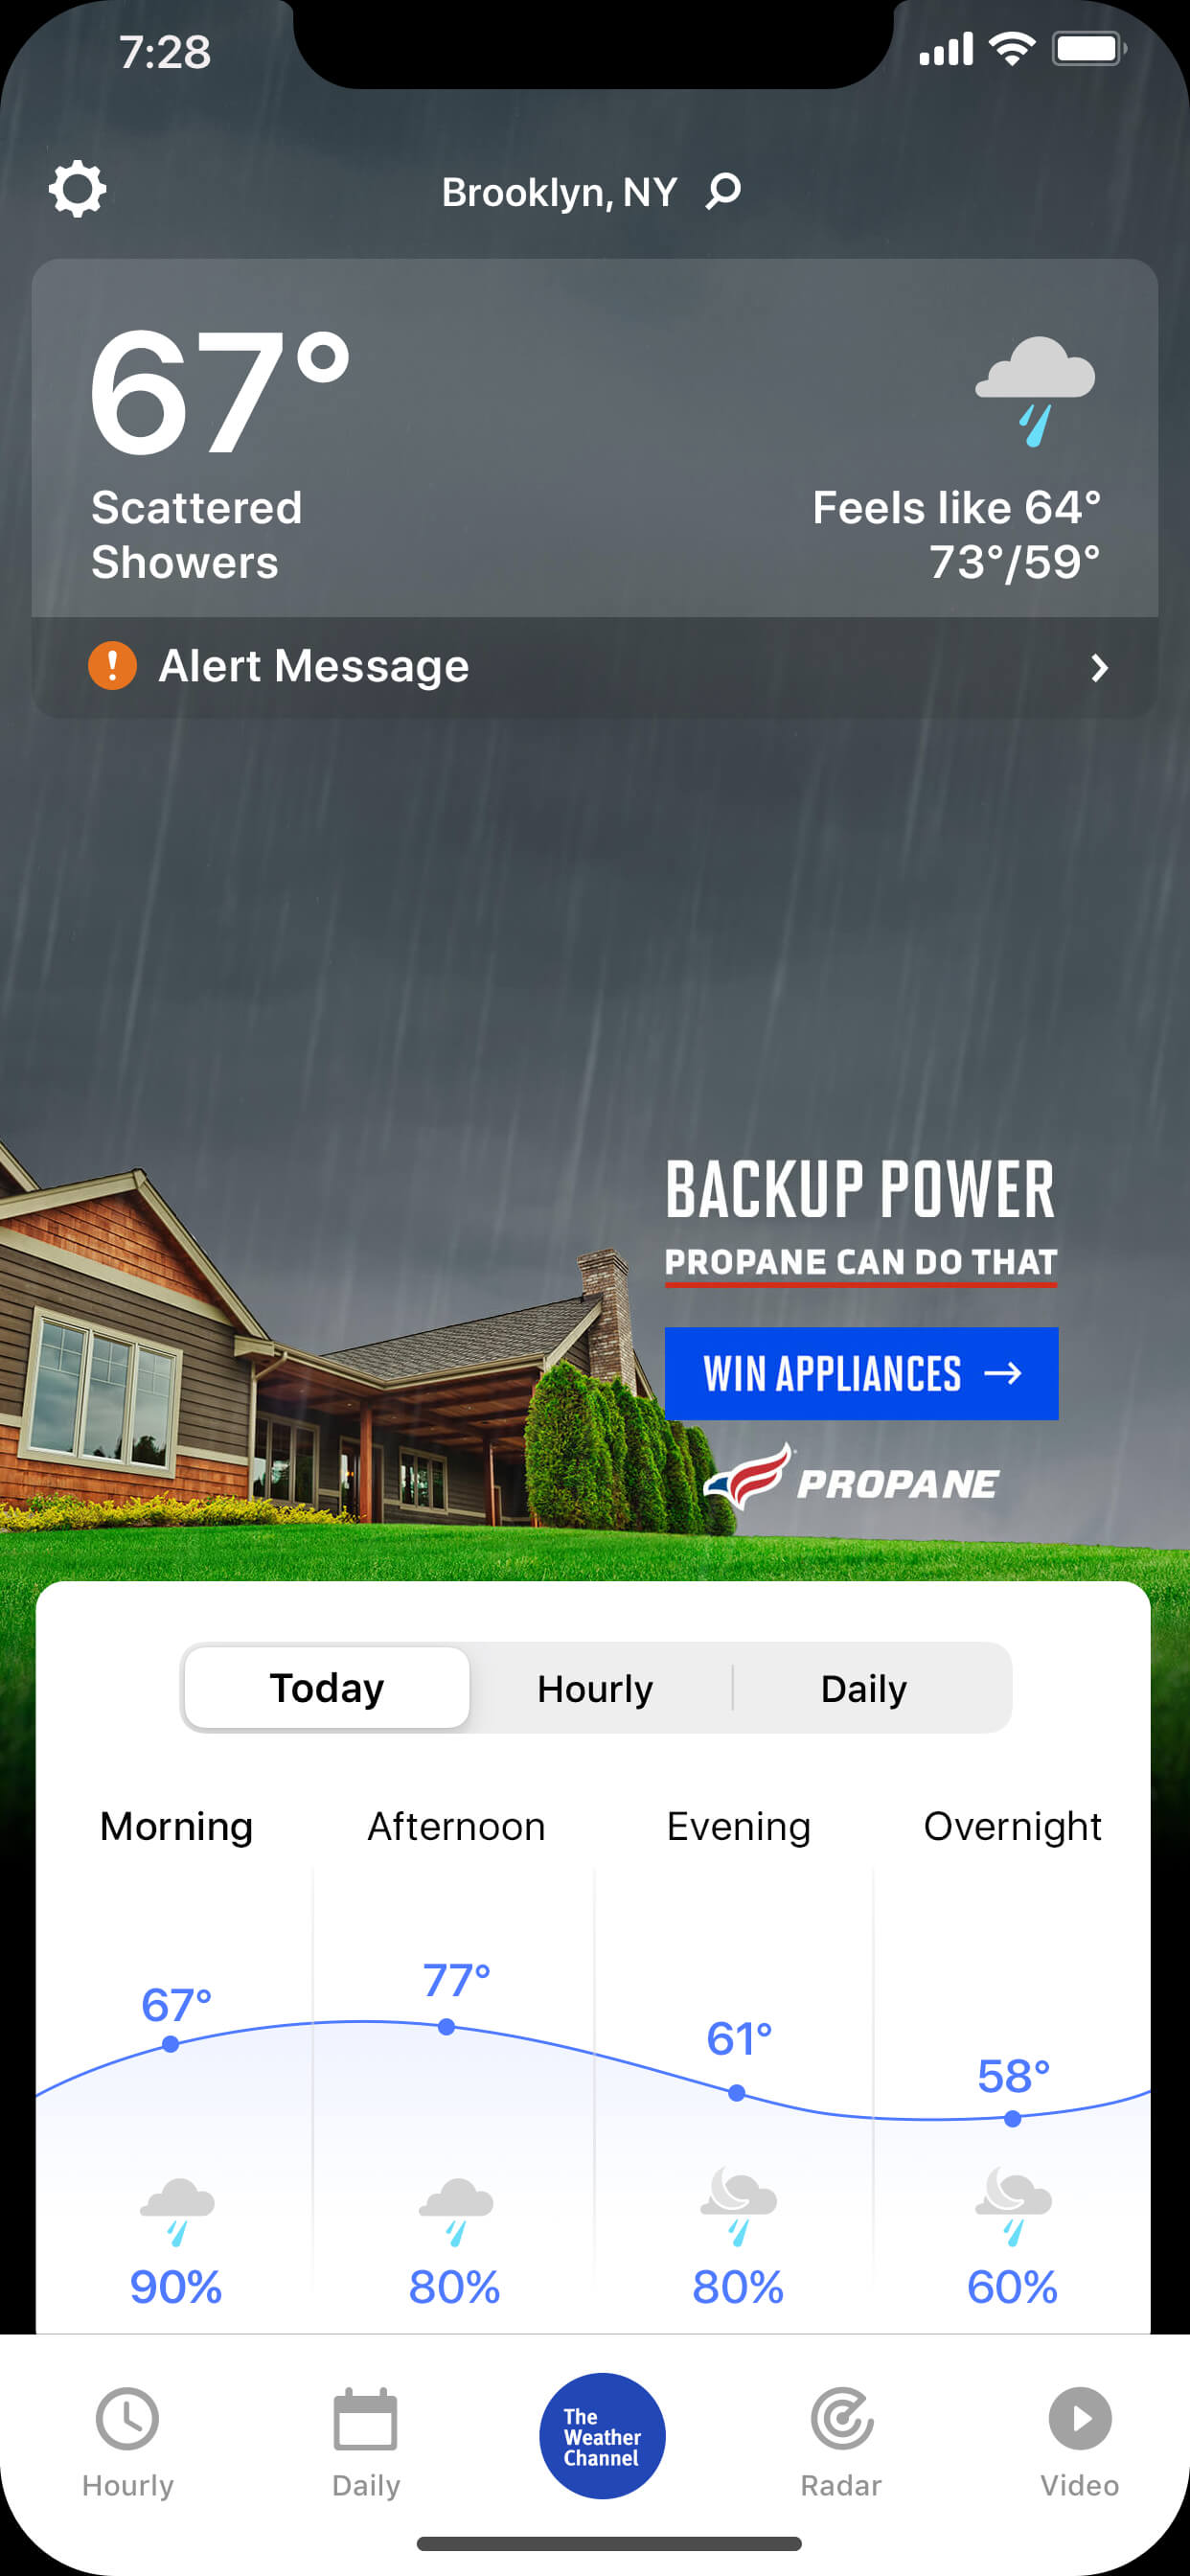 PERC_Mobile_App-IM_NextGen-Mock_rainy_day R2